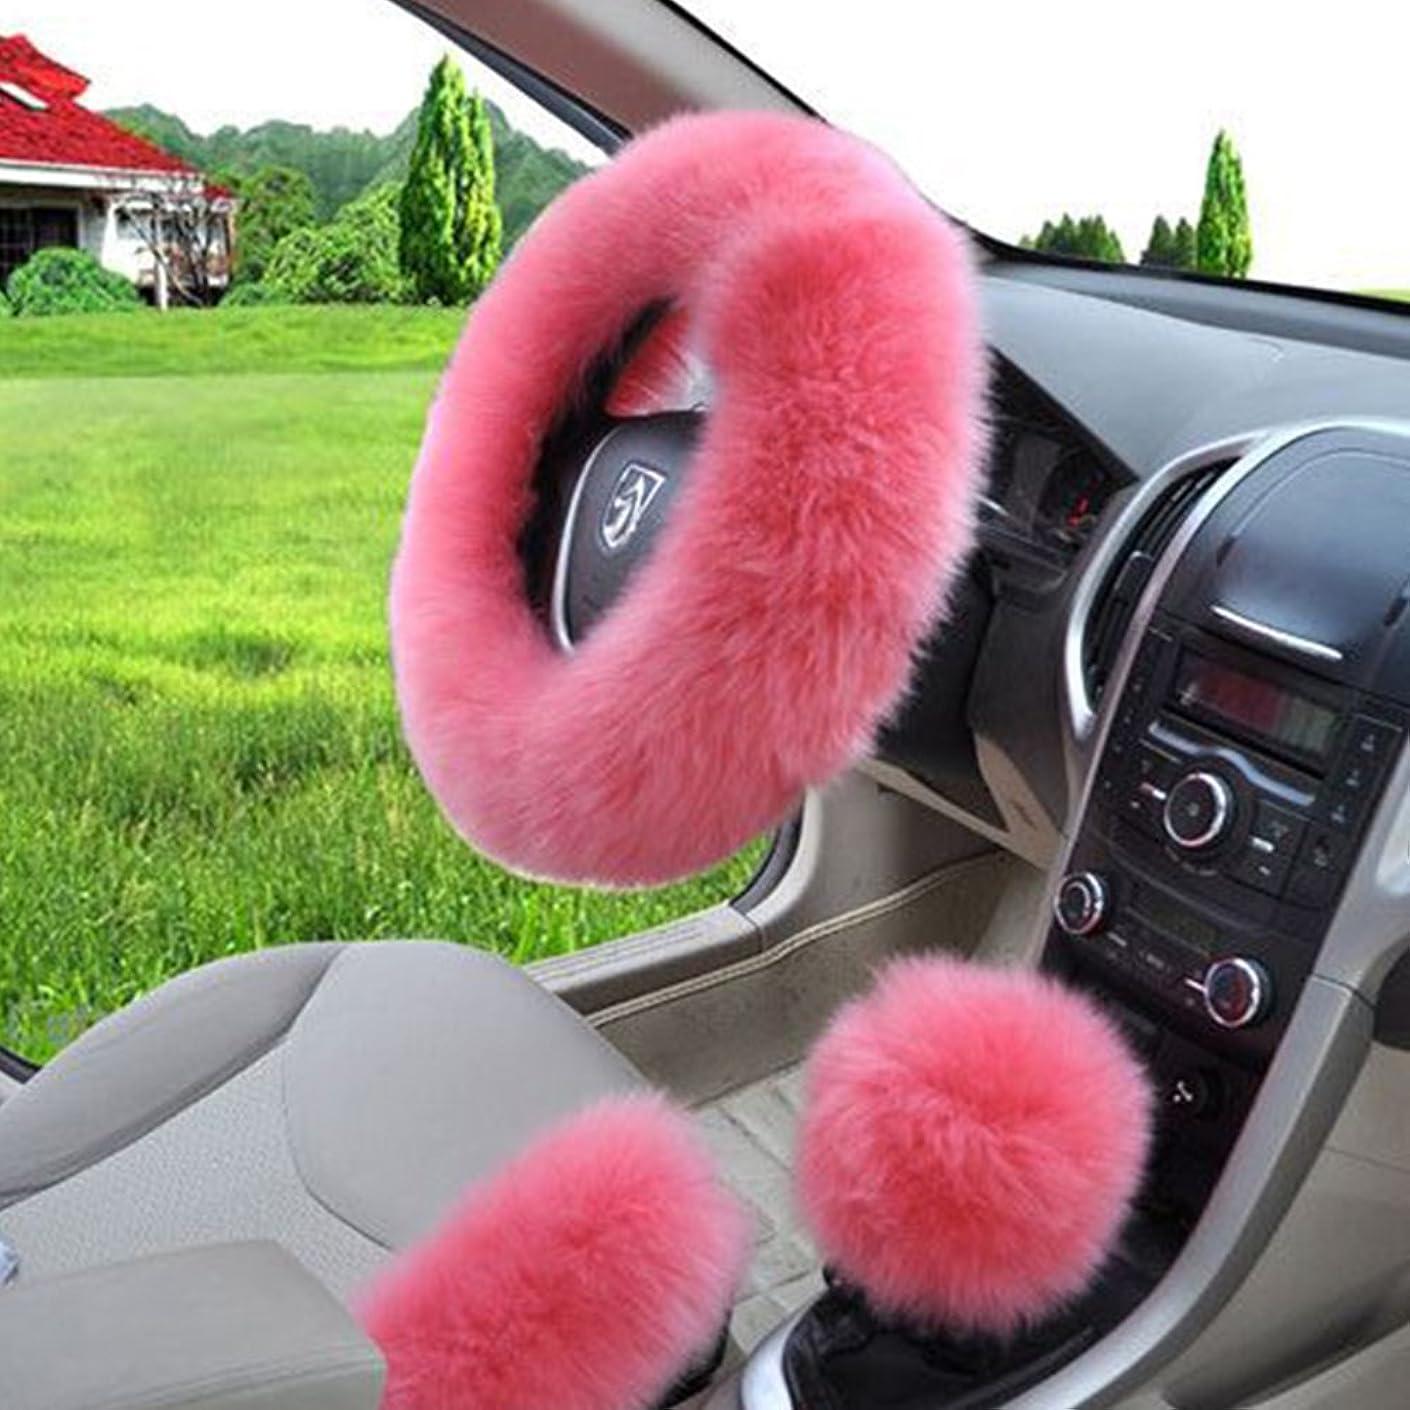 W-ShiG Winter Warm Faux Wool Handbrake Cover Gear Shift Cover Steering Wheel Cover 14.96